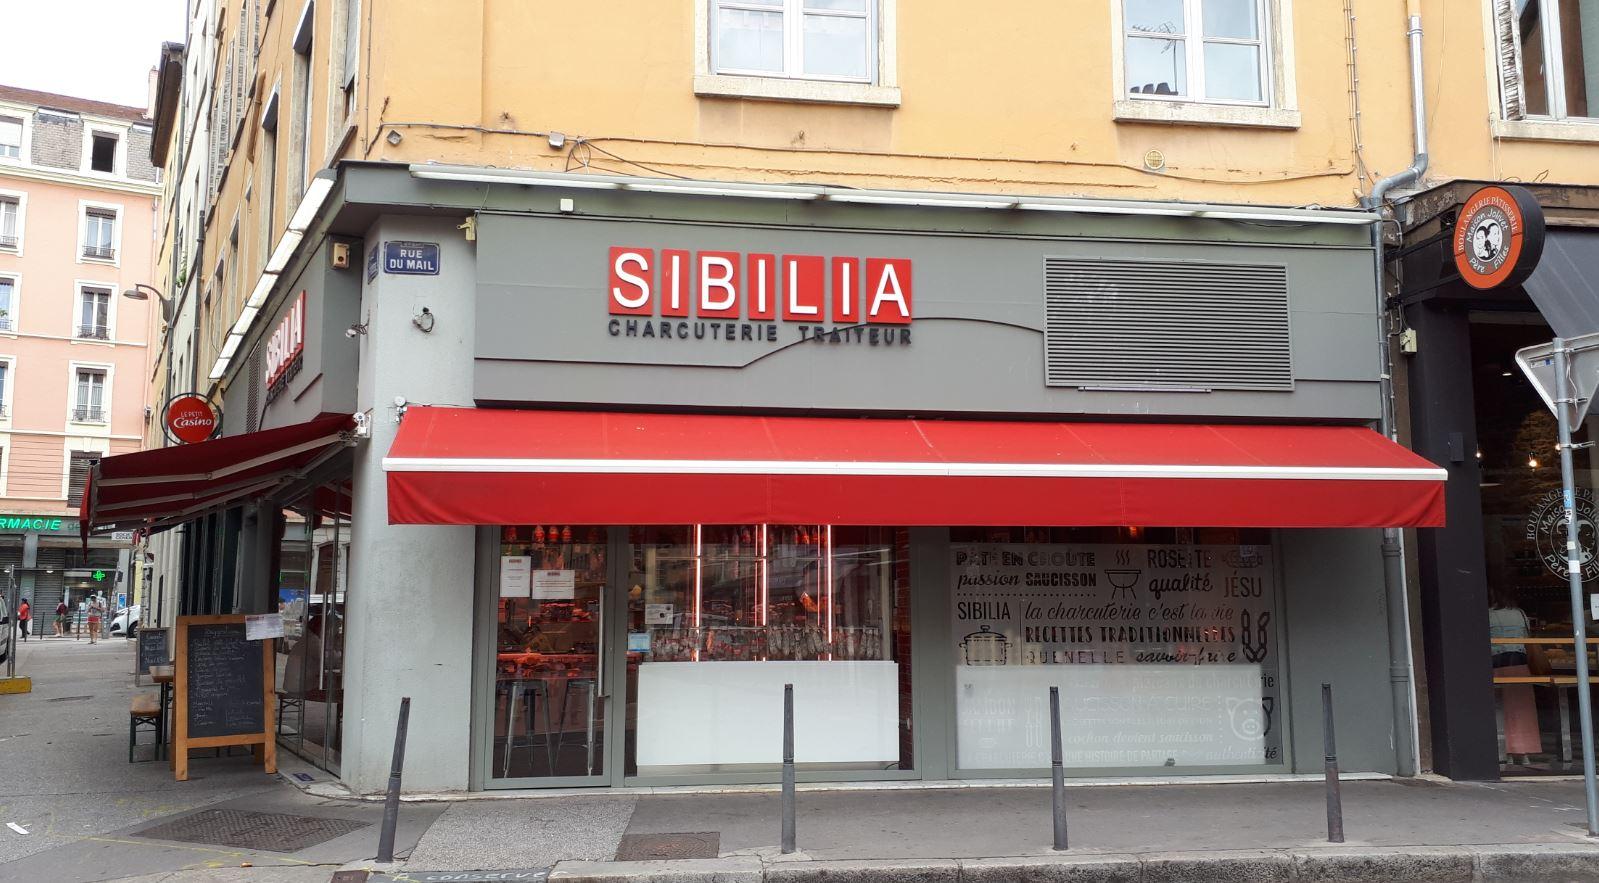 maison sibilia Lyon